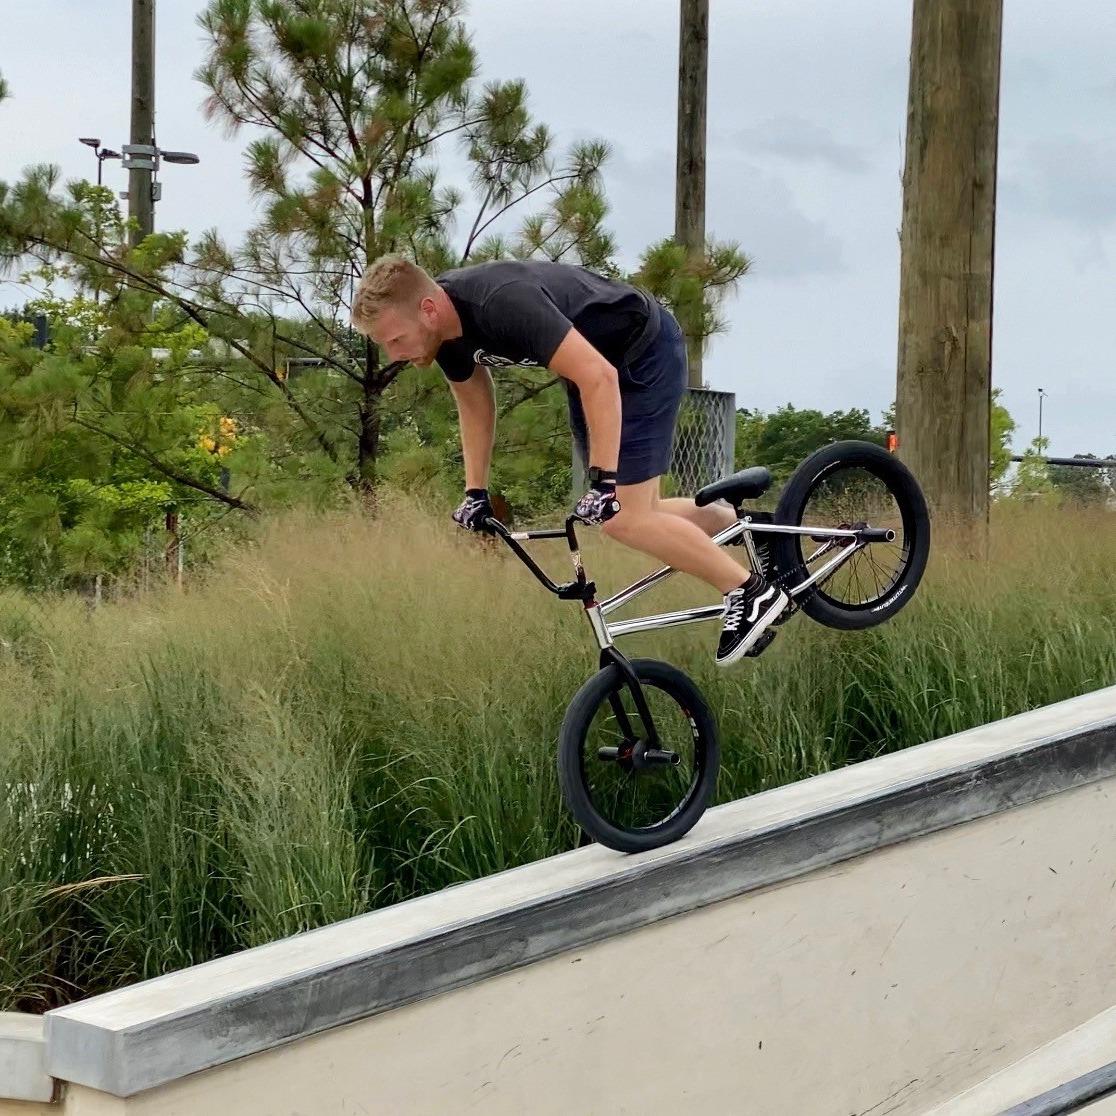 Jake doing a trick on his BMX bike